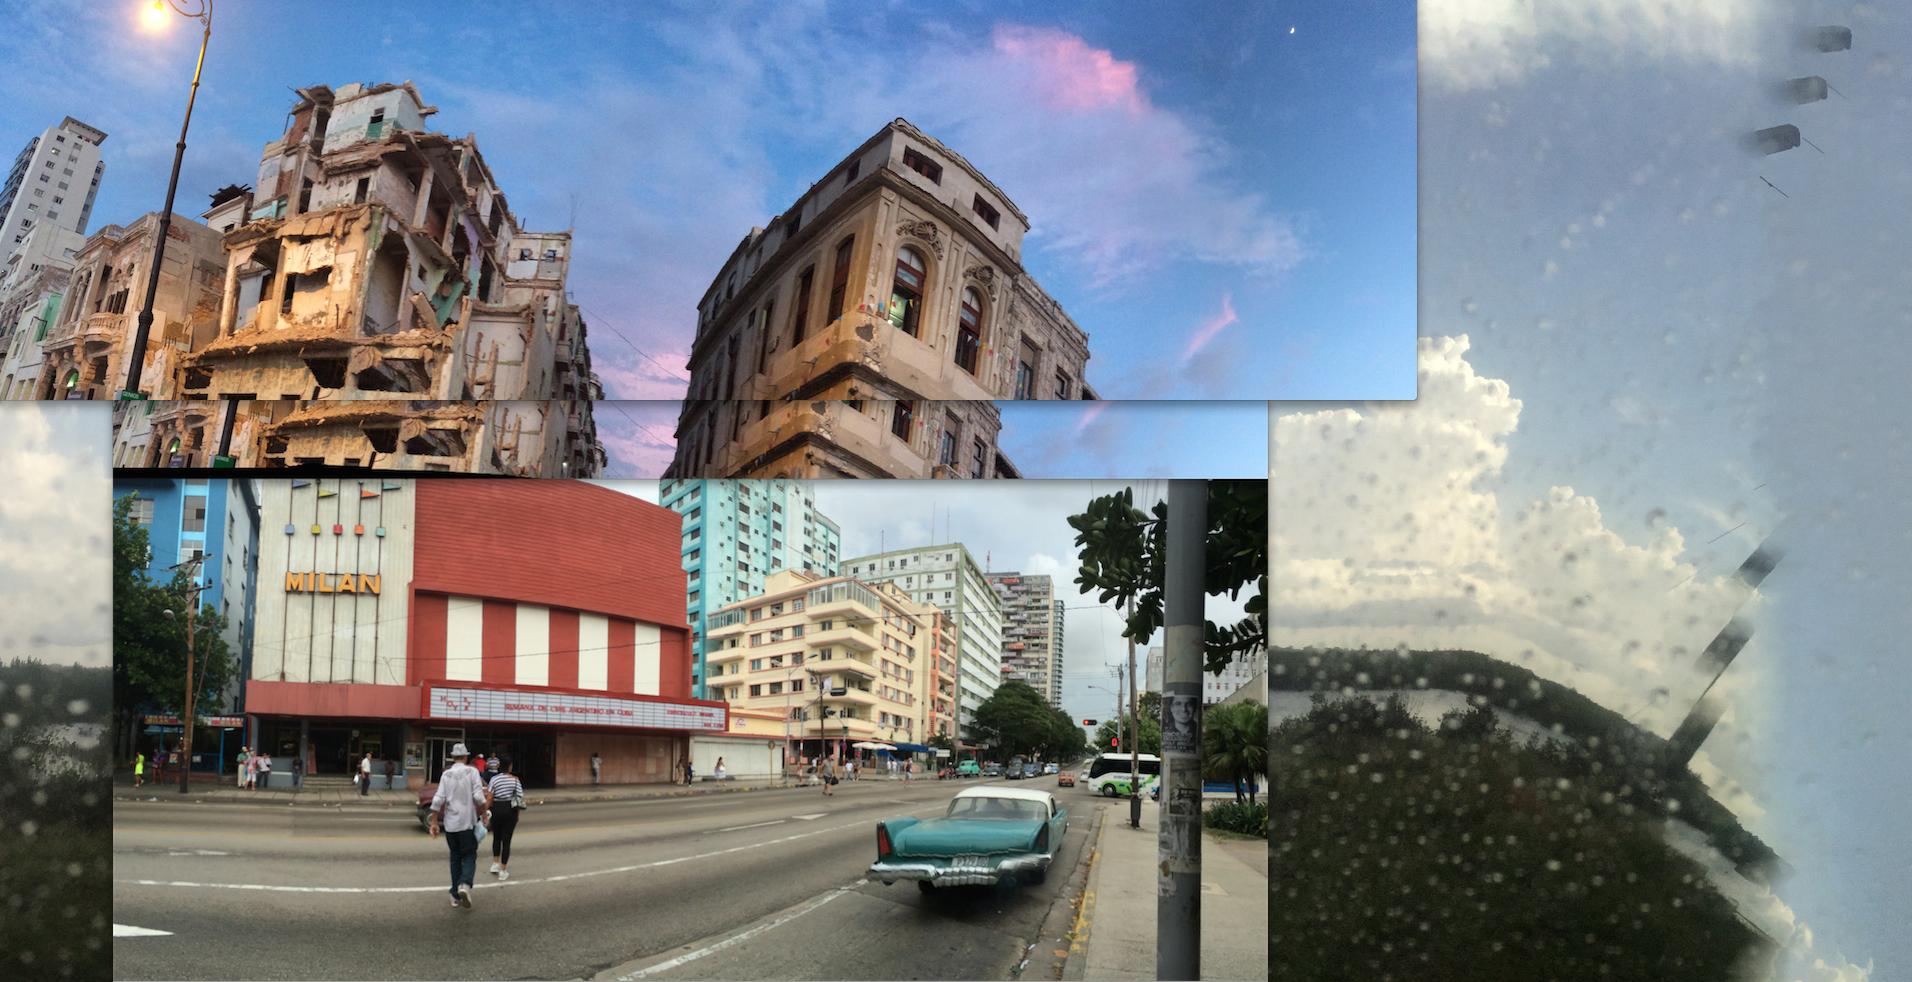 Havana-Trinidad 2015 May_3 Digital assembly; Copyright © Tennyson Woodbridge, 1963 to present